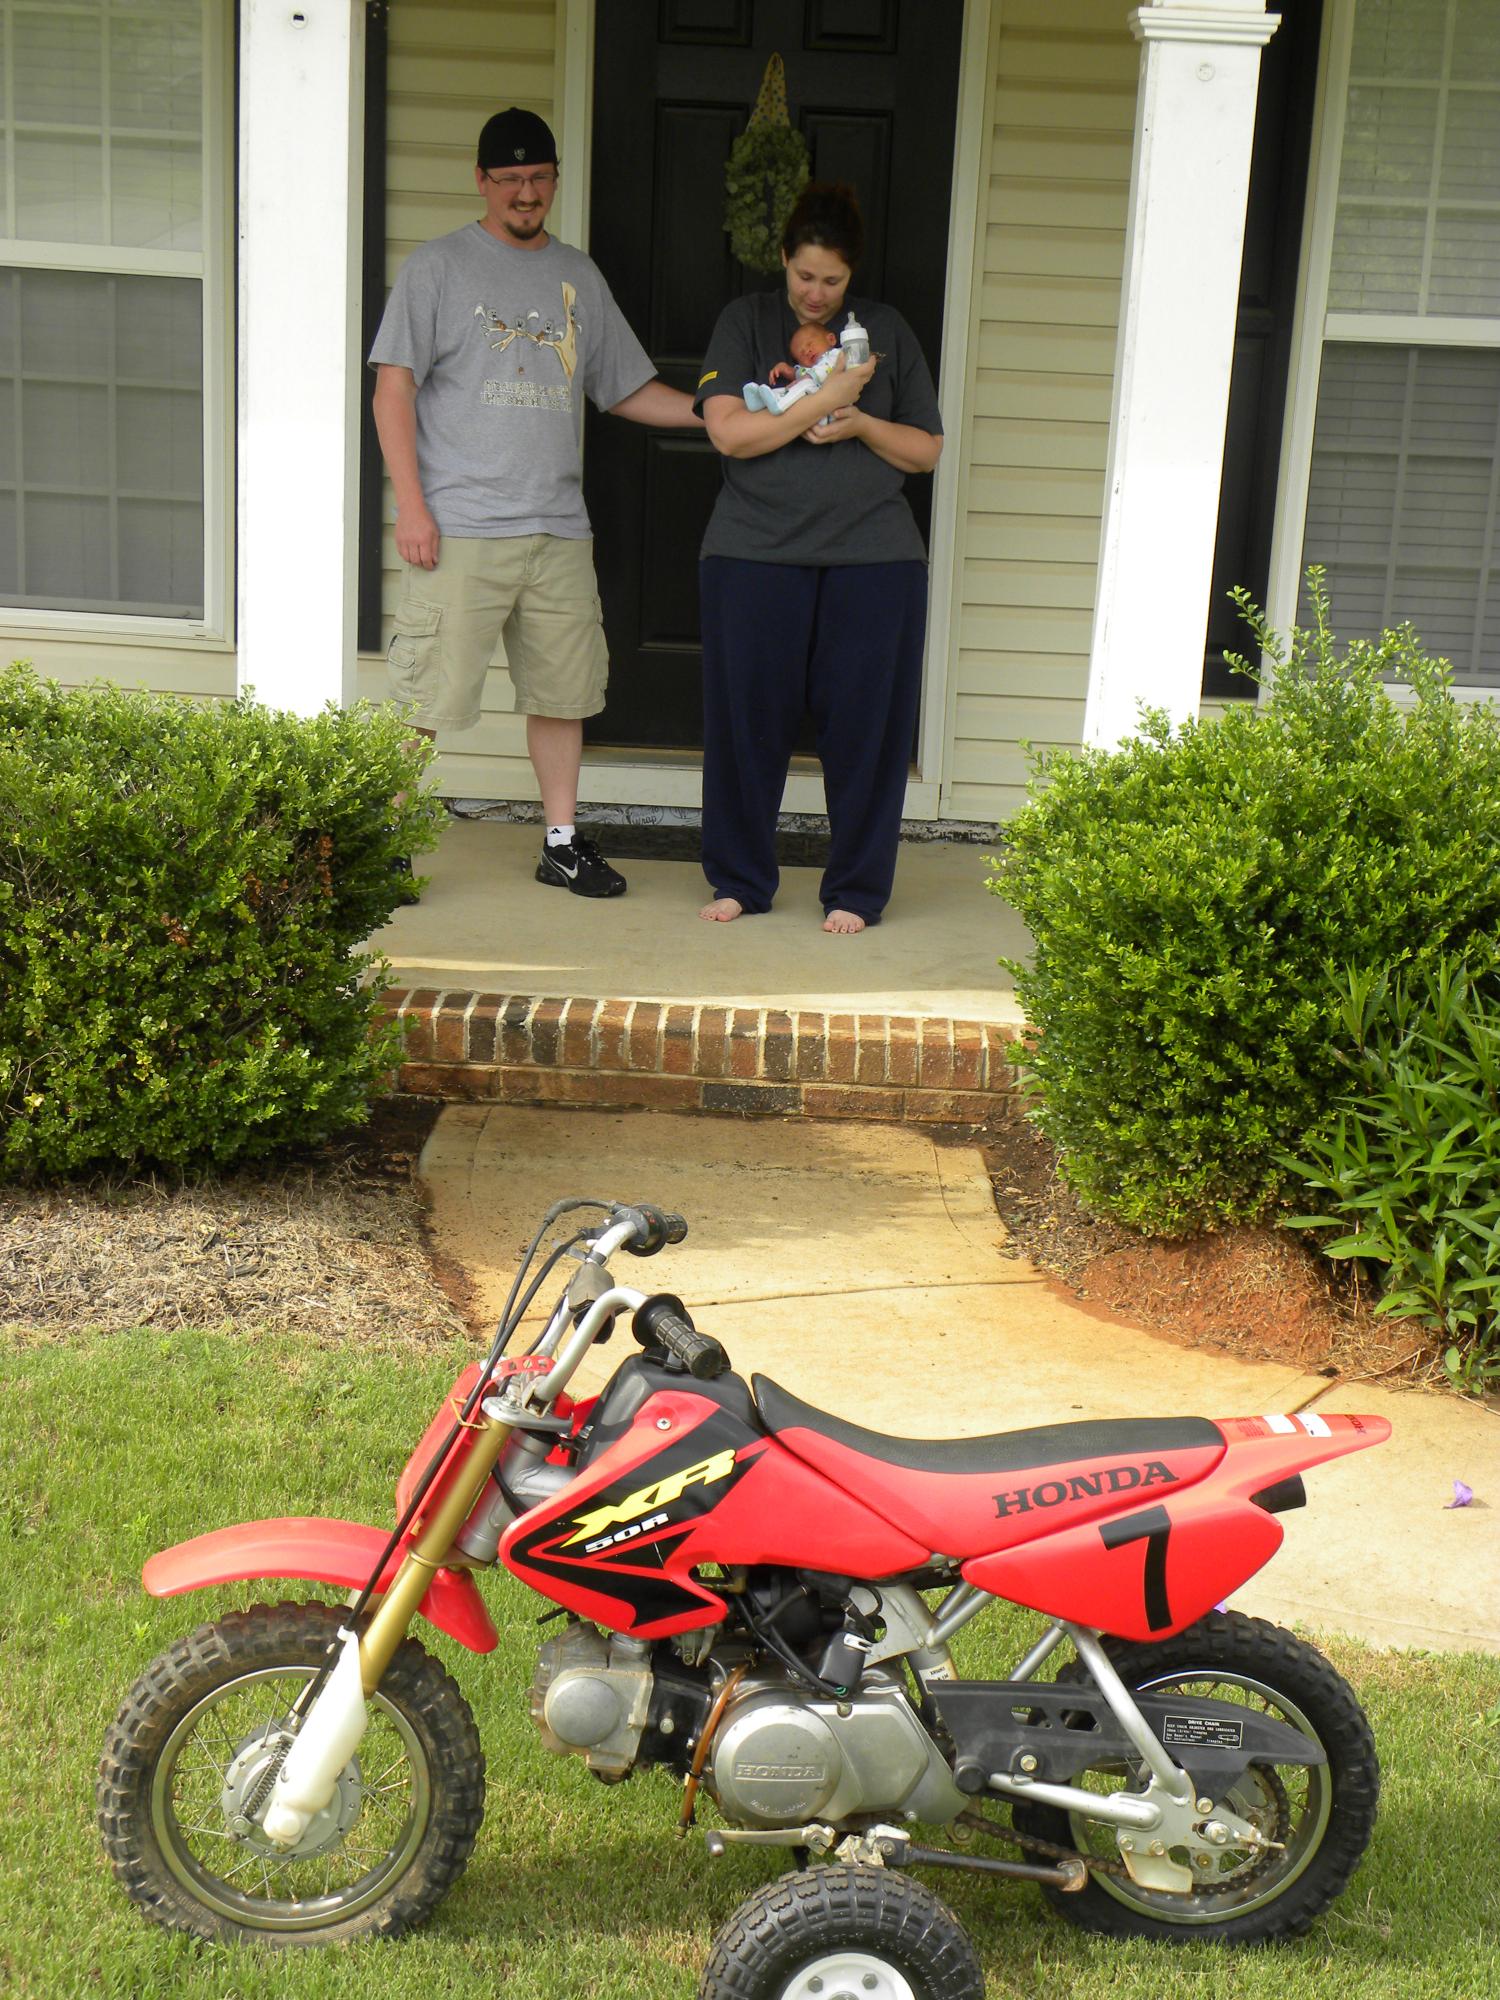 Dirt bike surprise